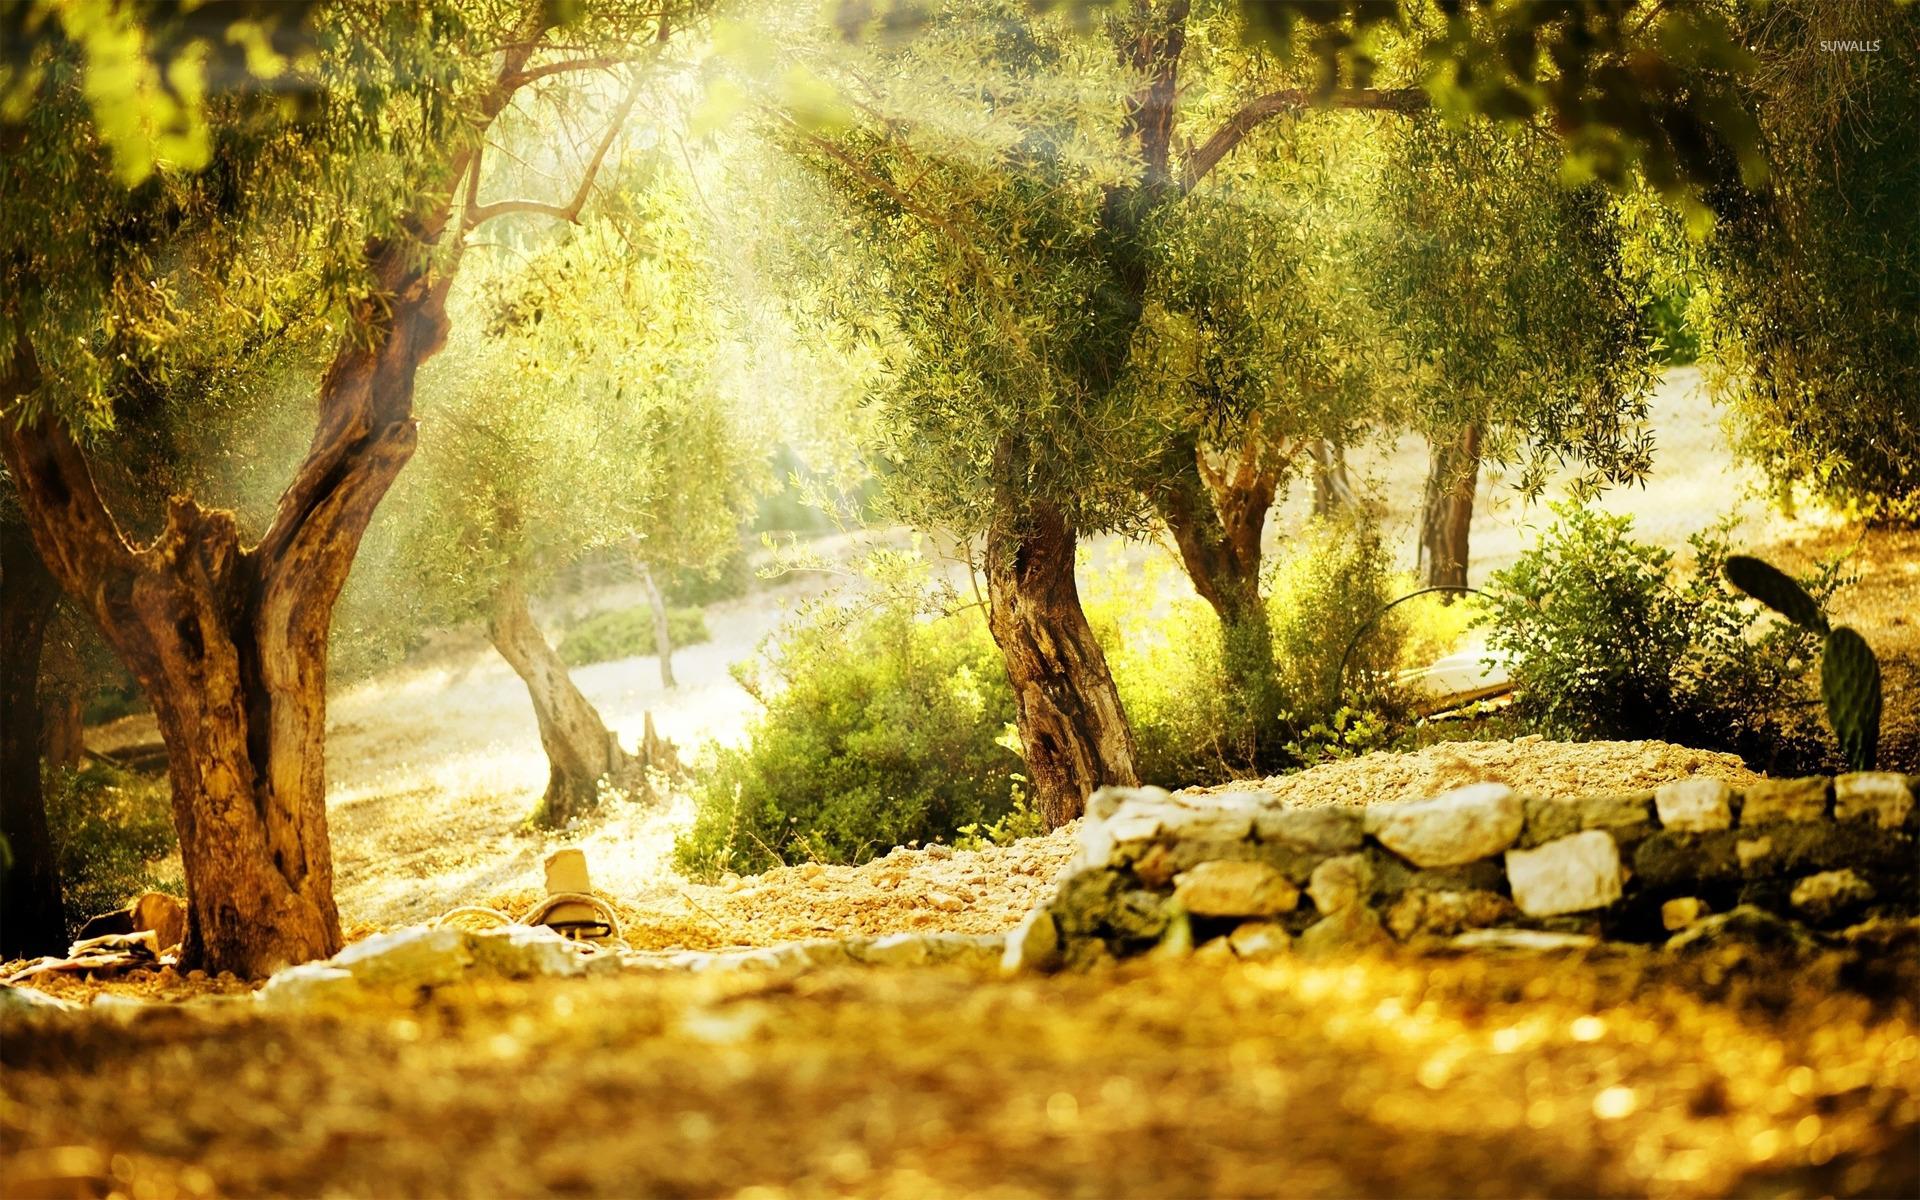 Nature Background Images Photoshop 1920x1200 Wallpaper Teahub Io